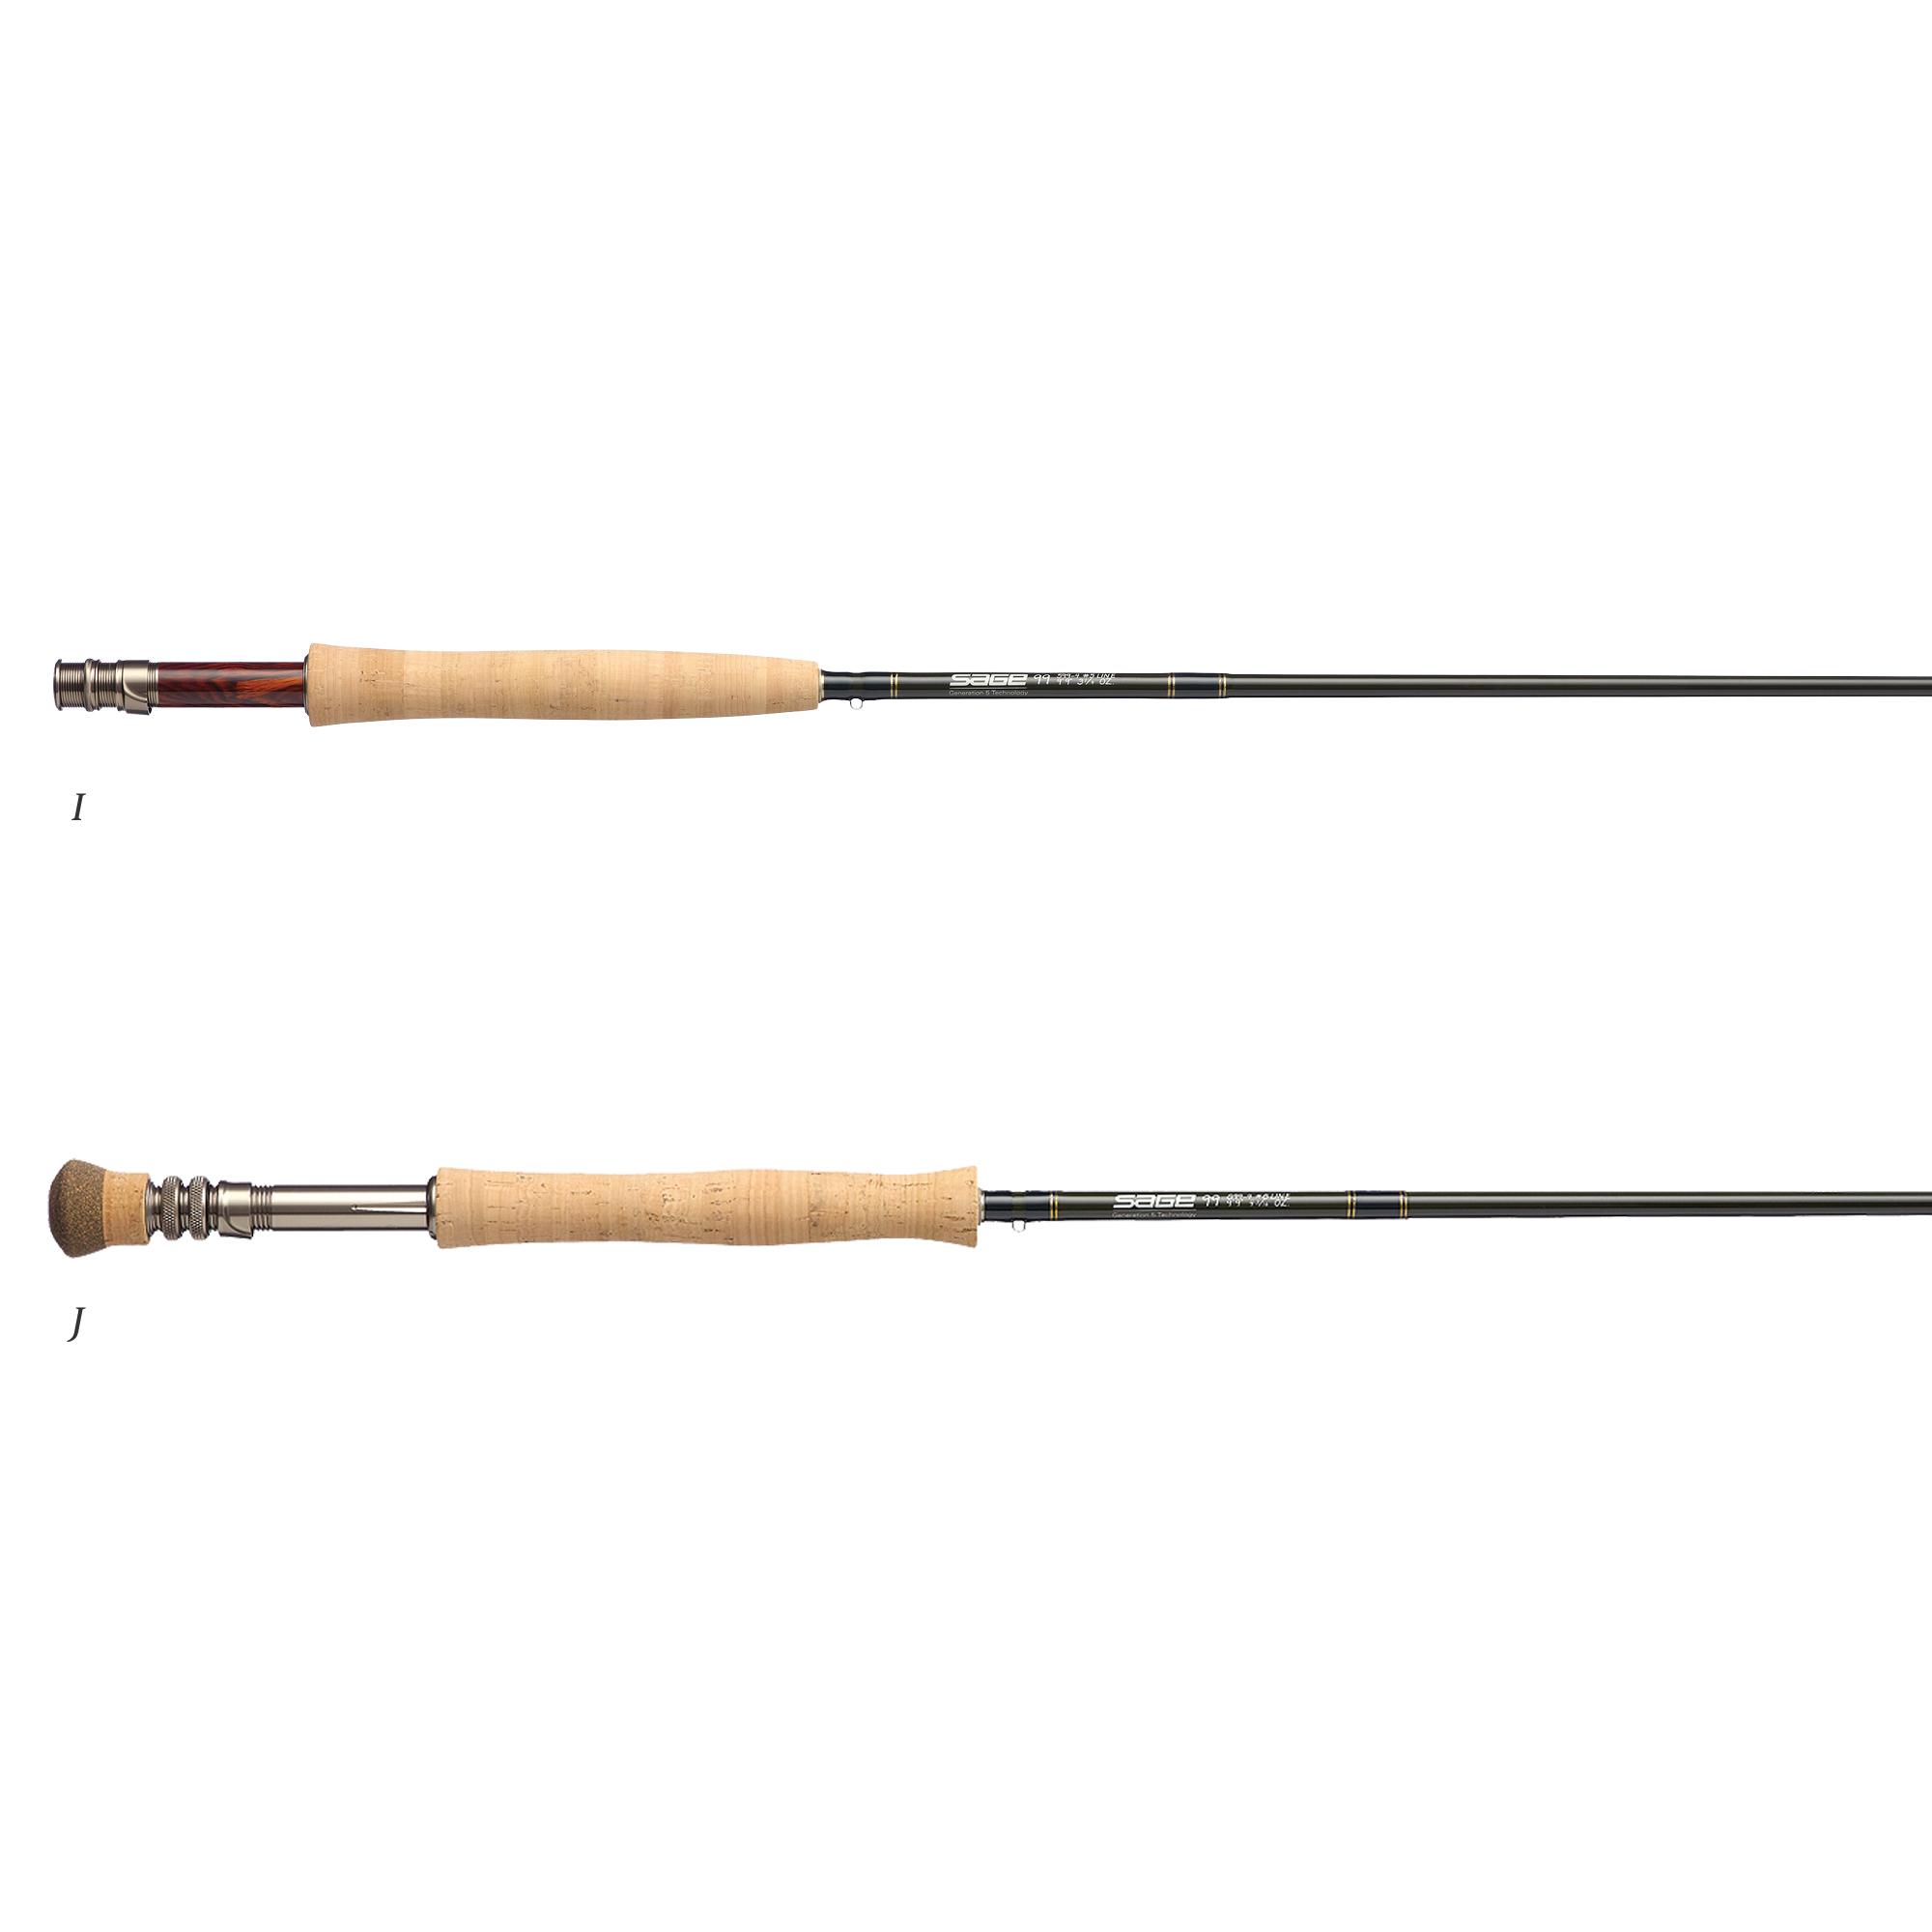 Sage 99 Rods